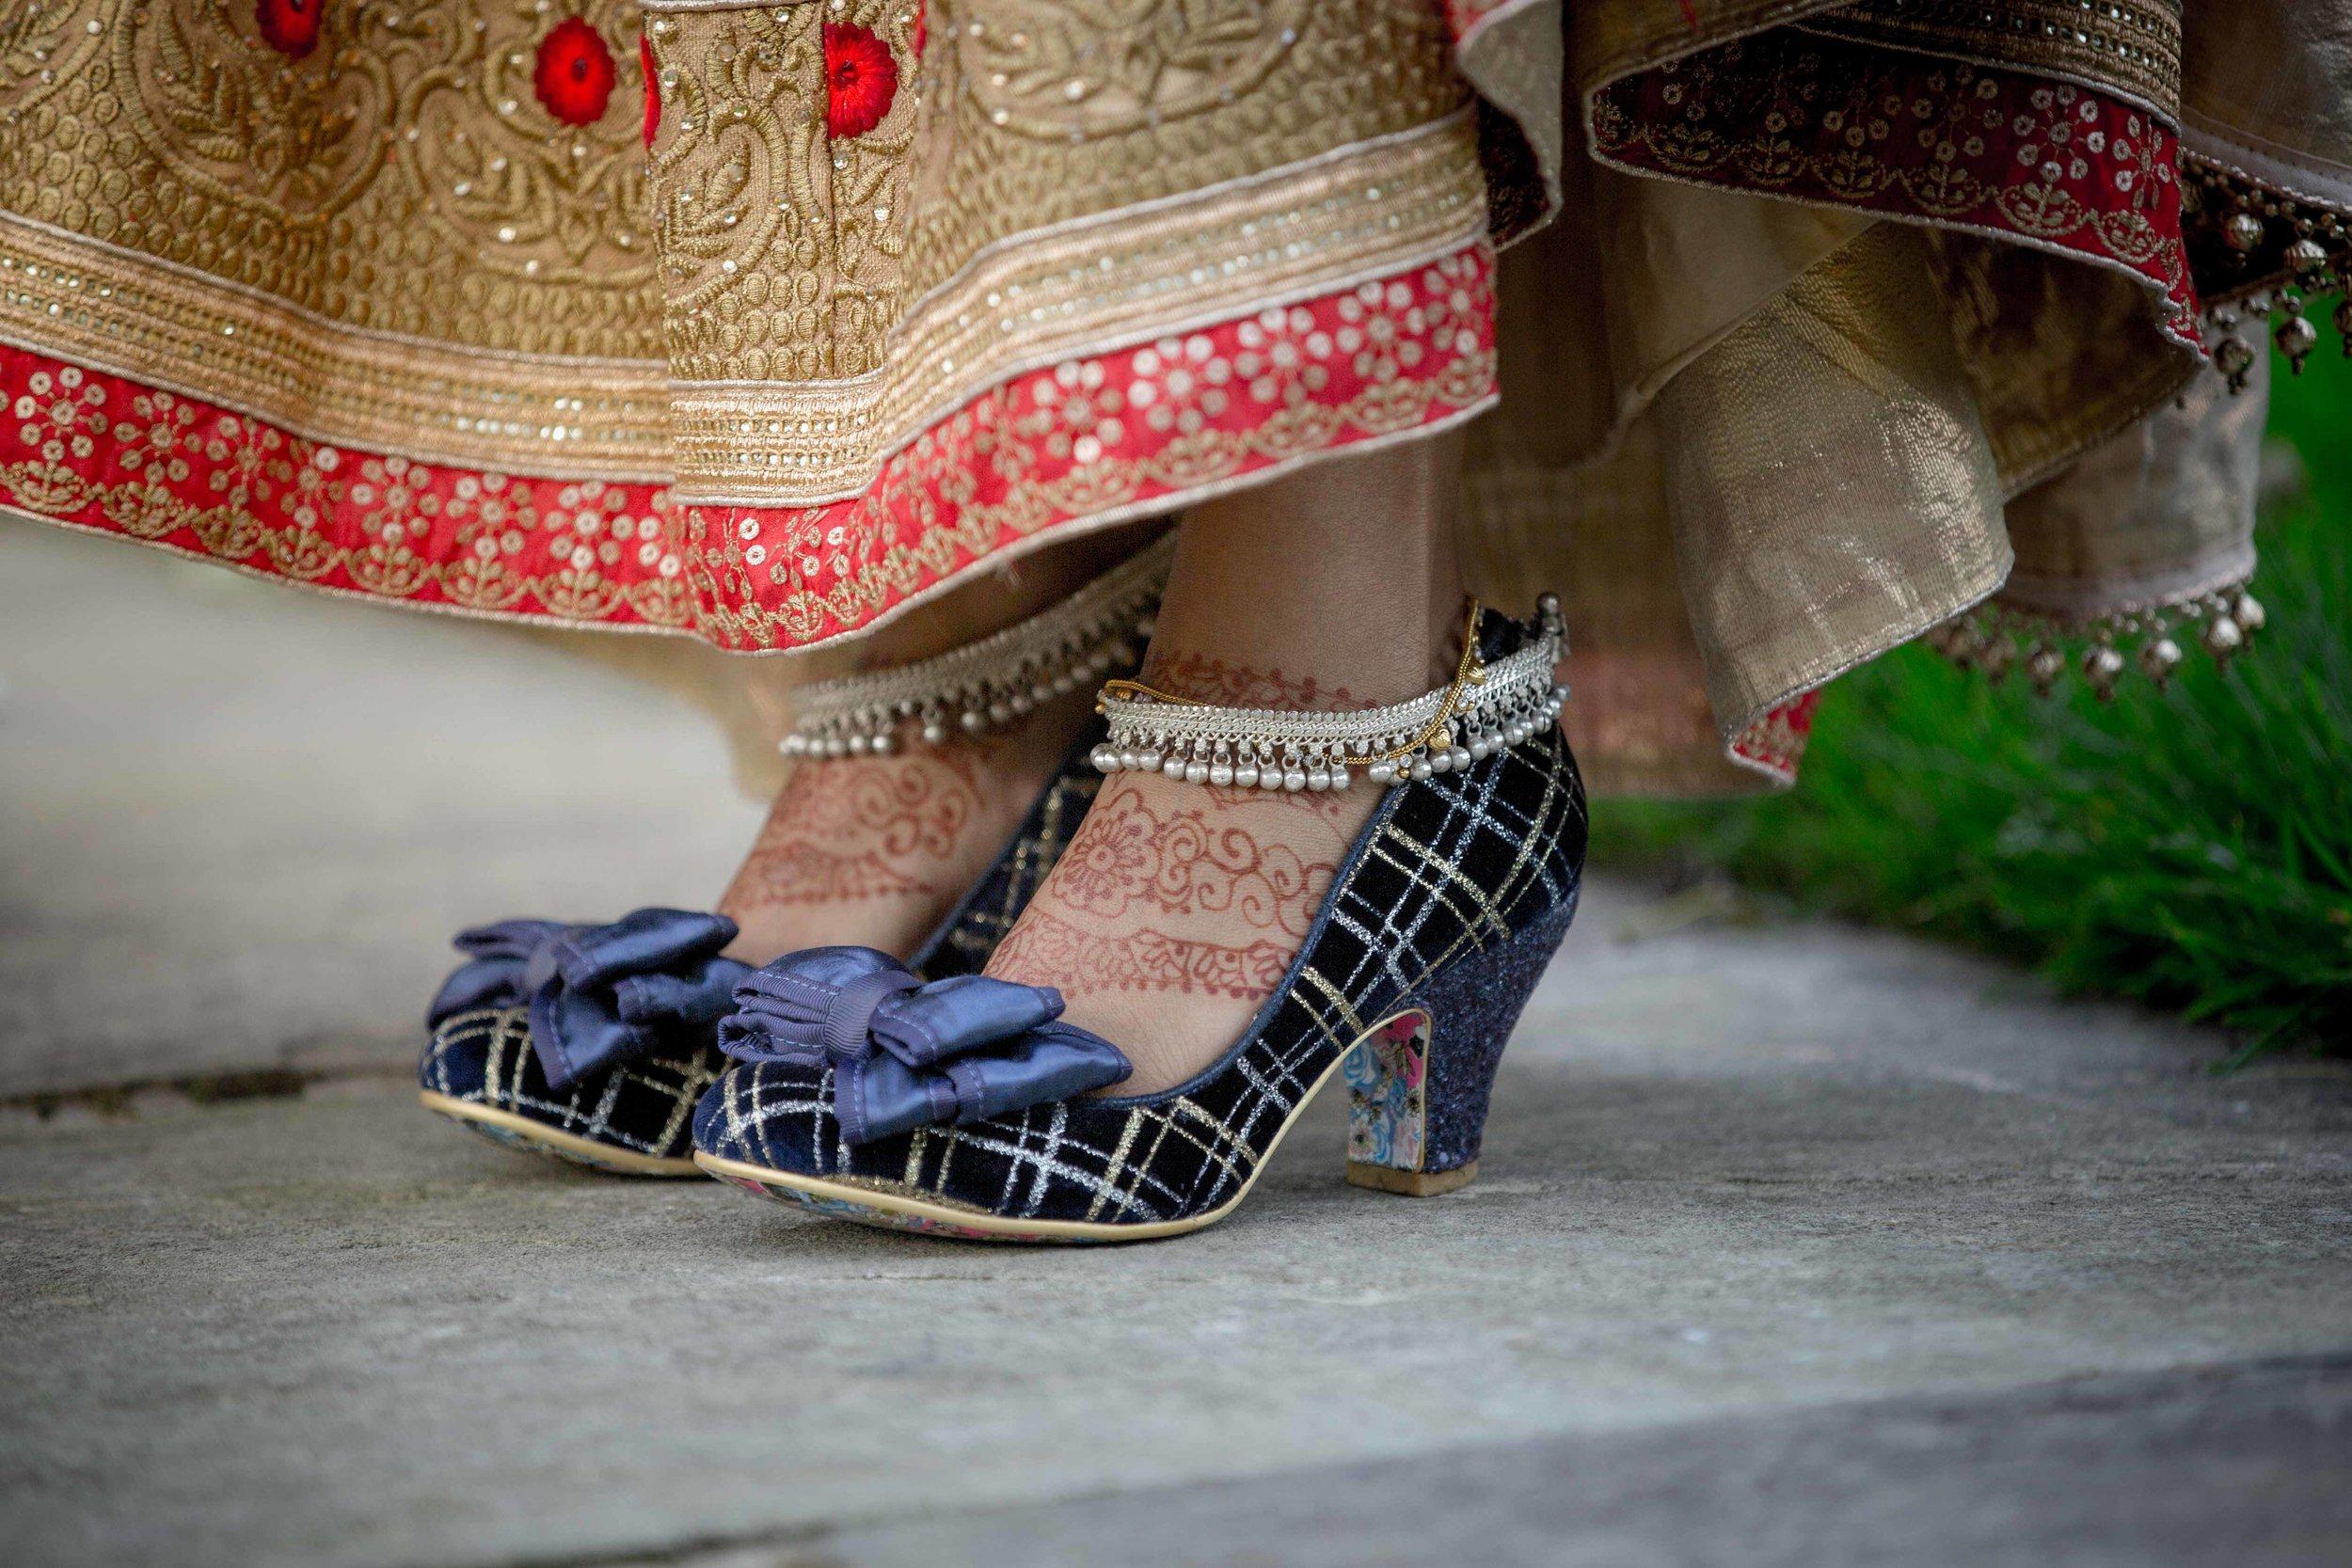 ramada-park-hall-hotel-birmingham-wolverhampton-hindu-wedding-asian-wedding-photography-natalia-smith-photography-38.jpg